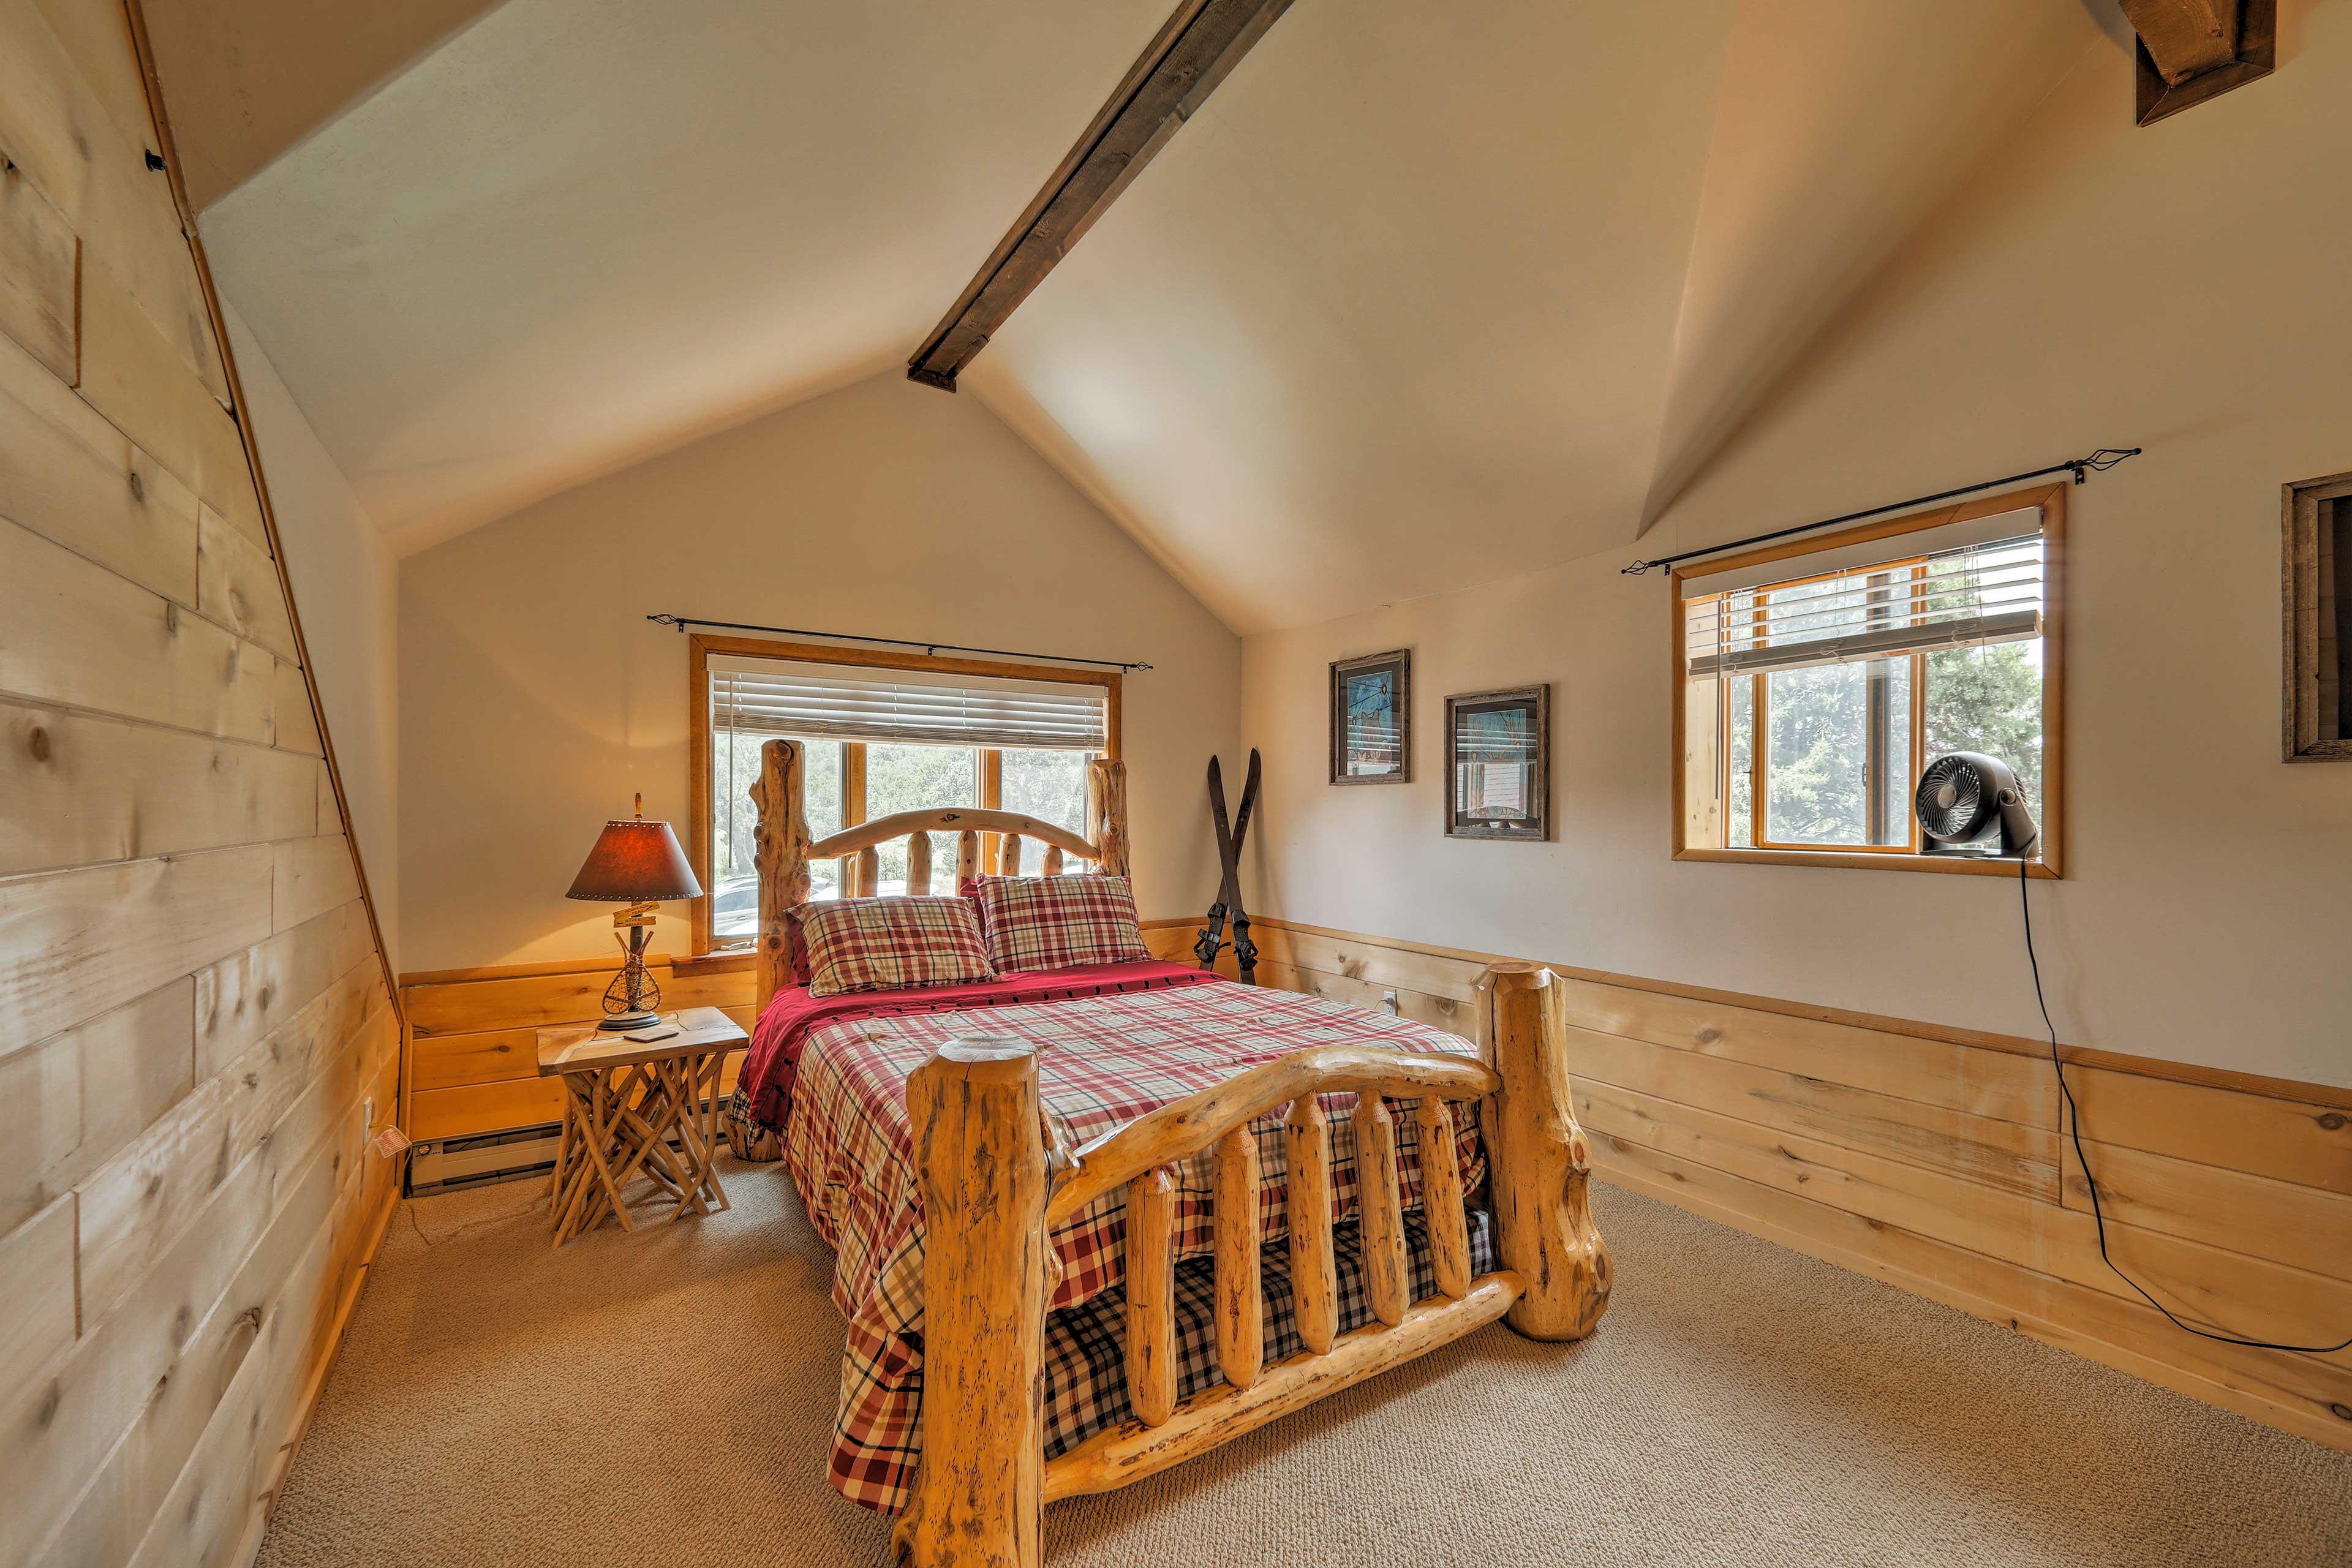 The third bedroom has a queen bed and an additional queen mattress below!